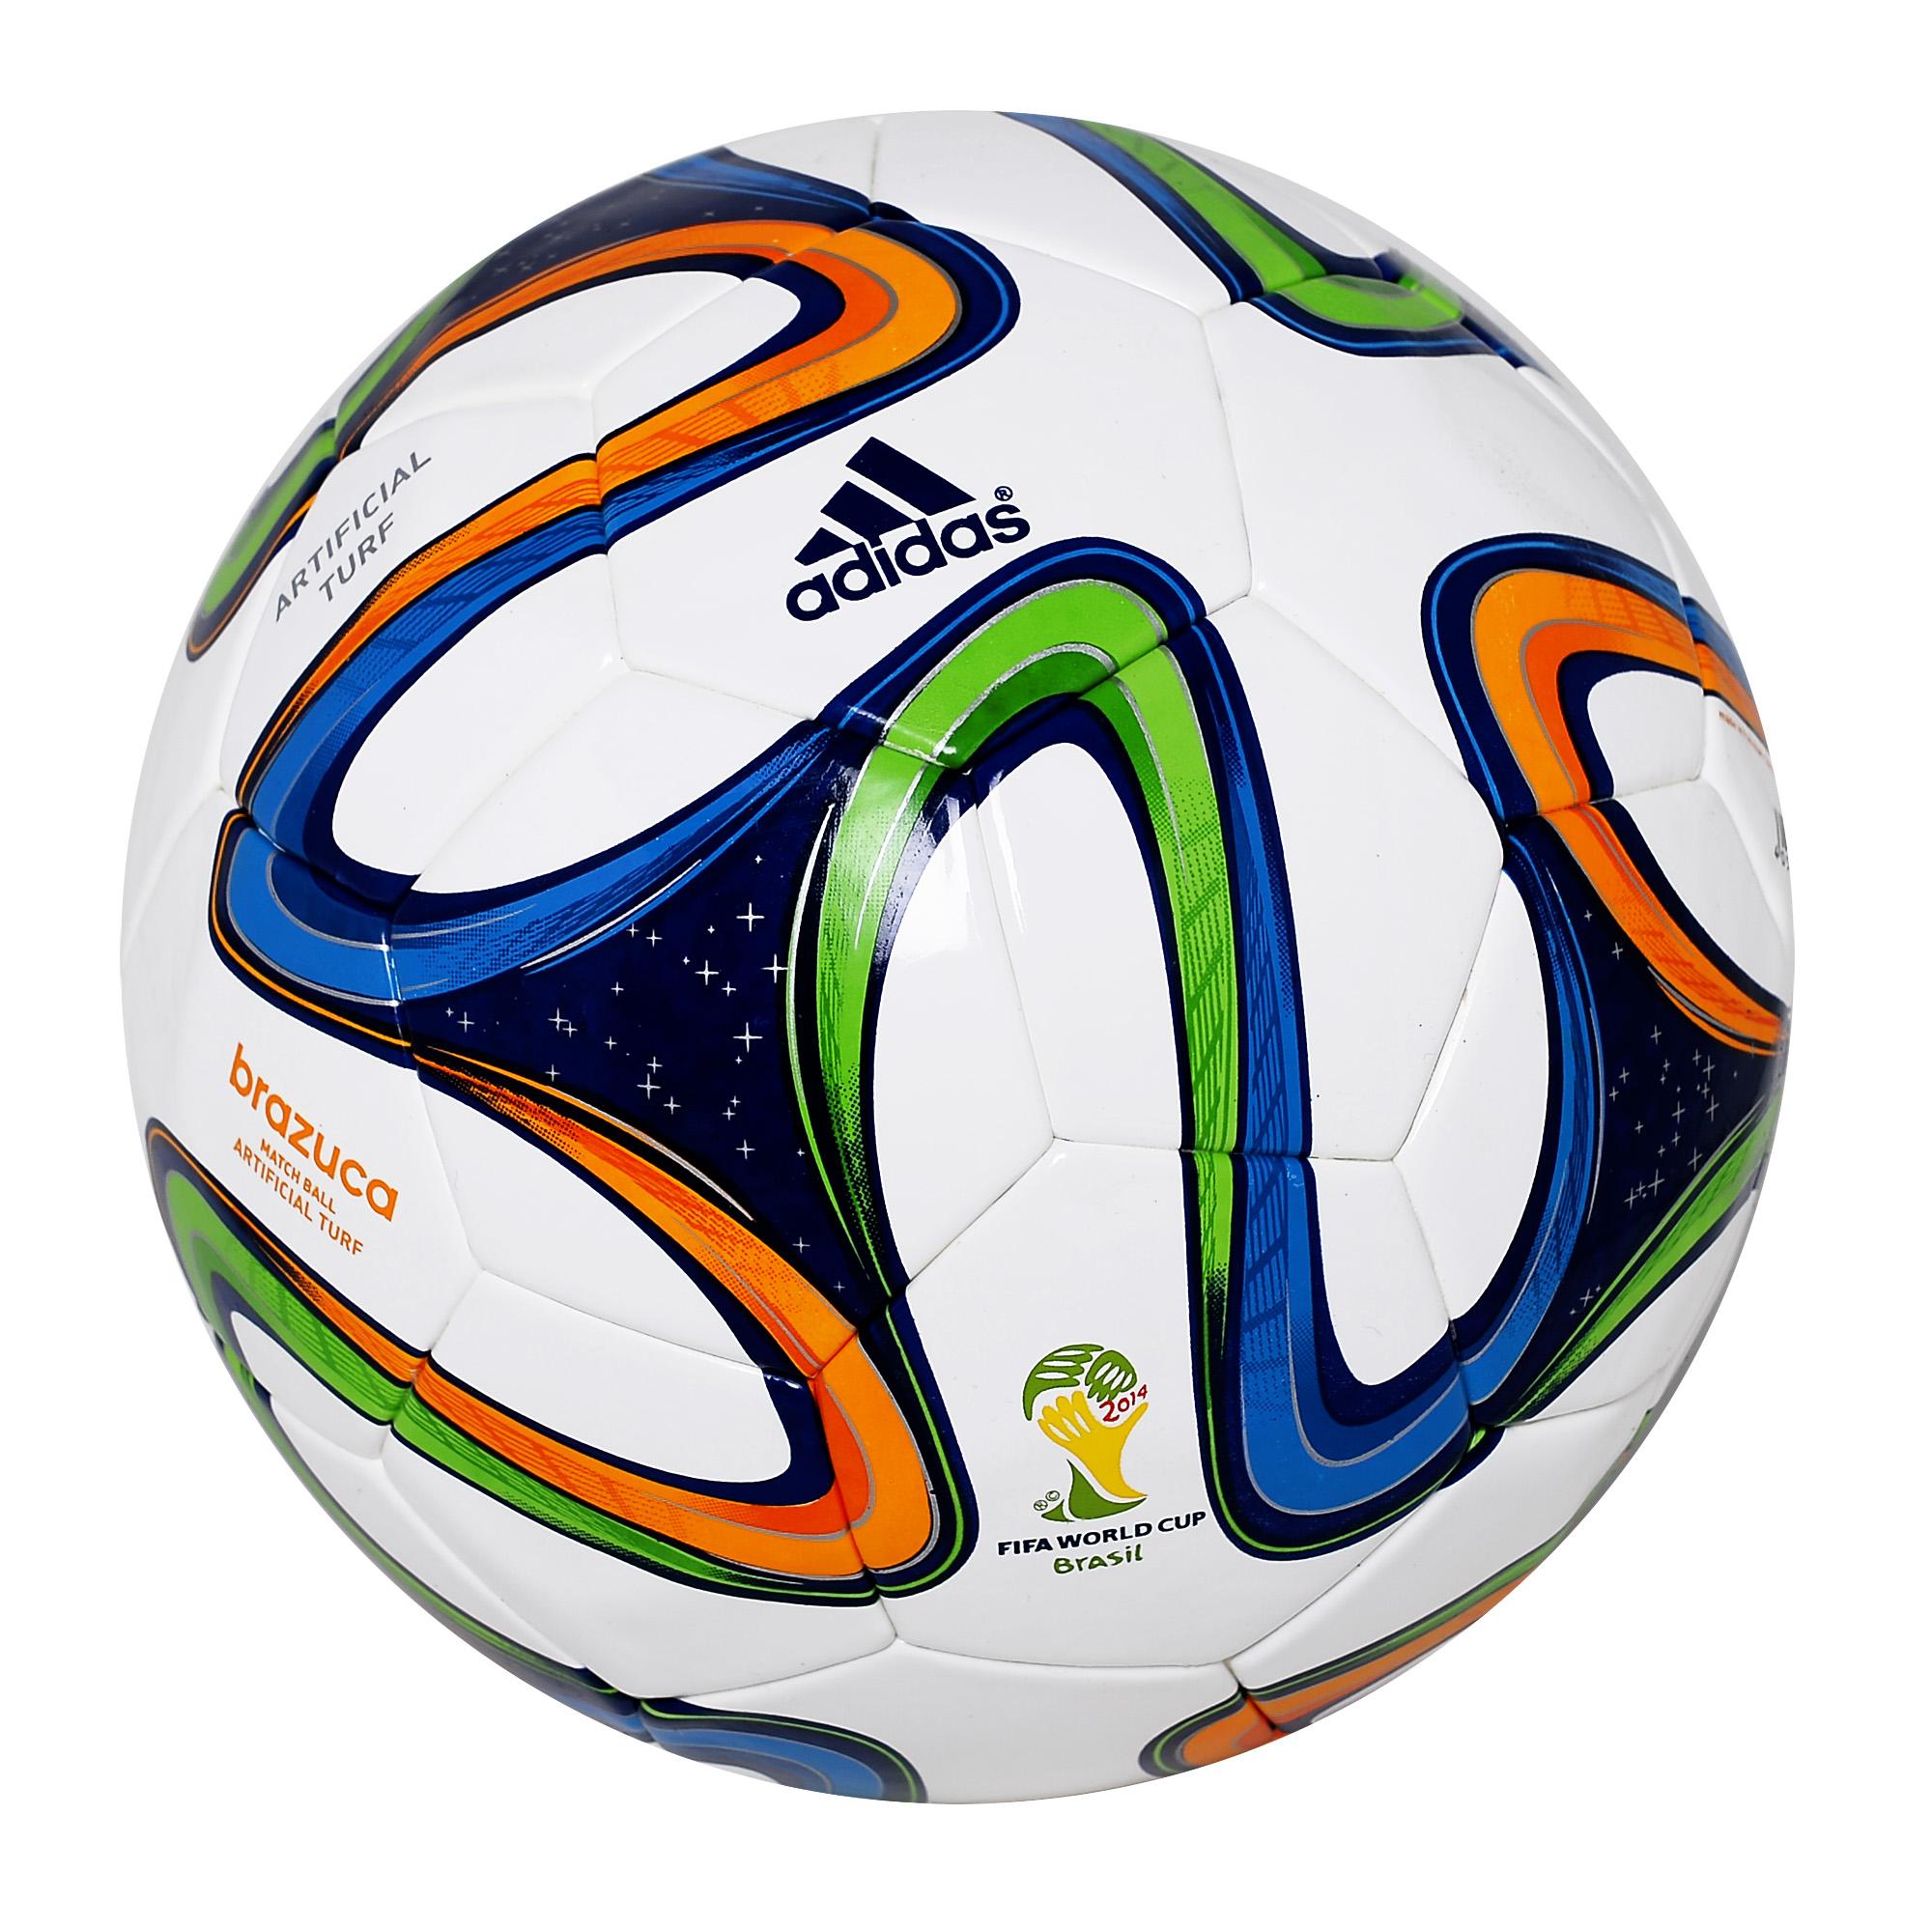 649a96bdf8e3e ... Piłka nożna Adidas Brazuca Match Ball Replica T-Mobile Esktraklasa  Glider 5 Brazylia